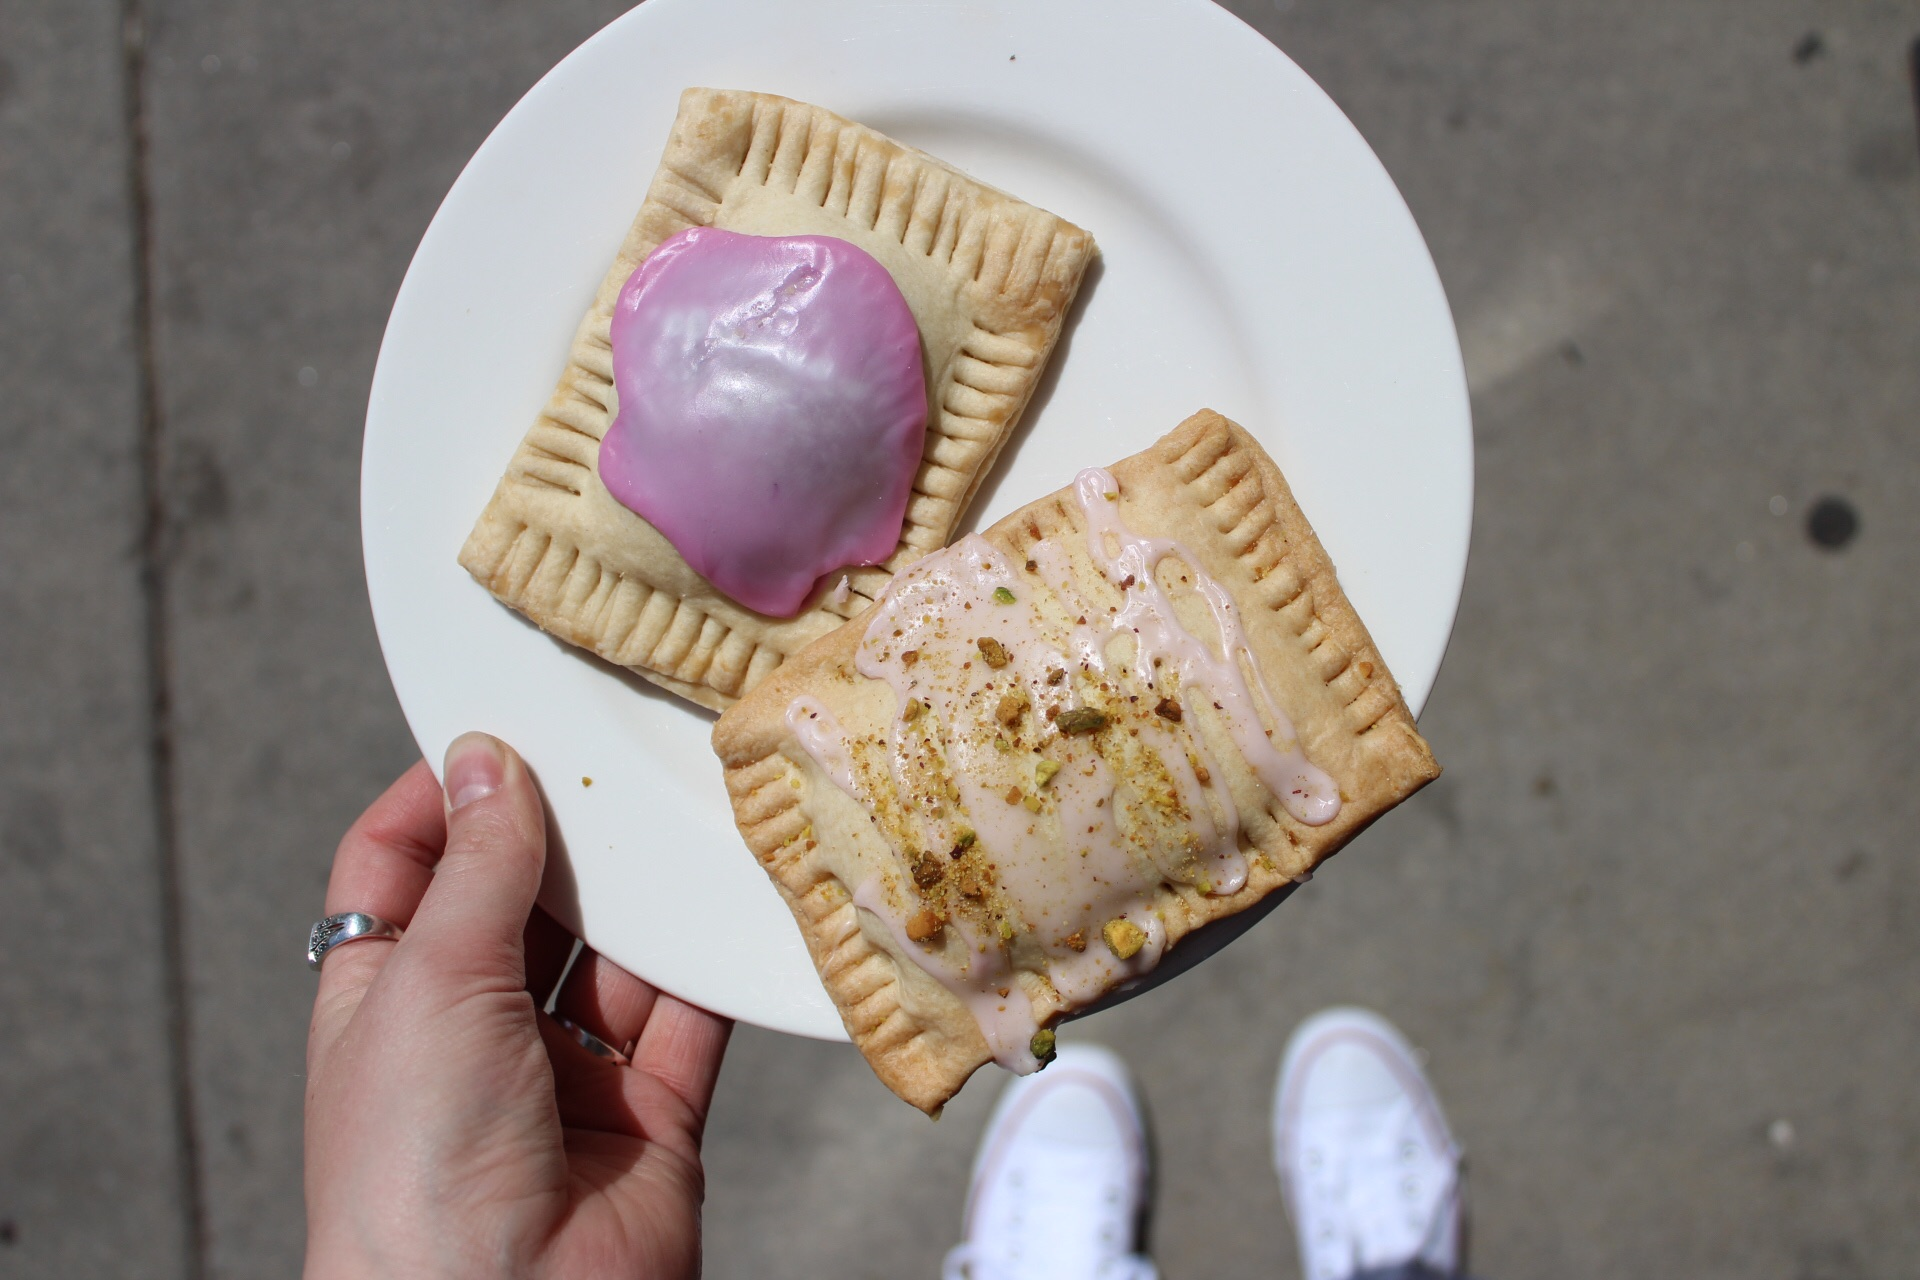 best-desserts-in-denver-homemade-pop-tarts-sugar-bake-shop